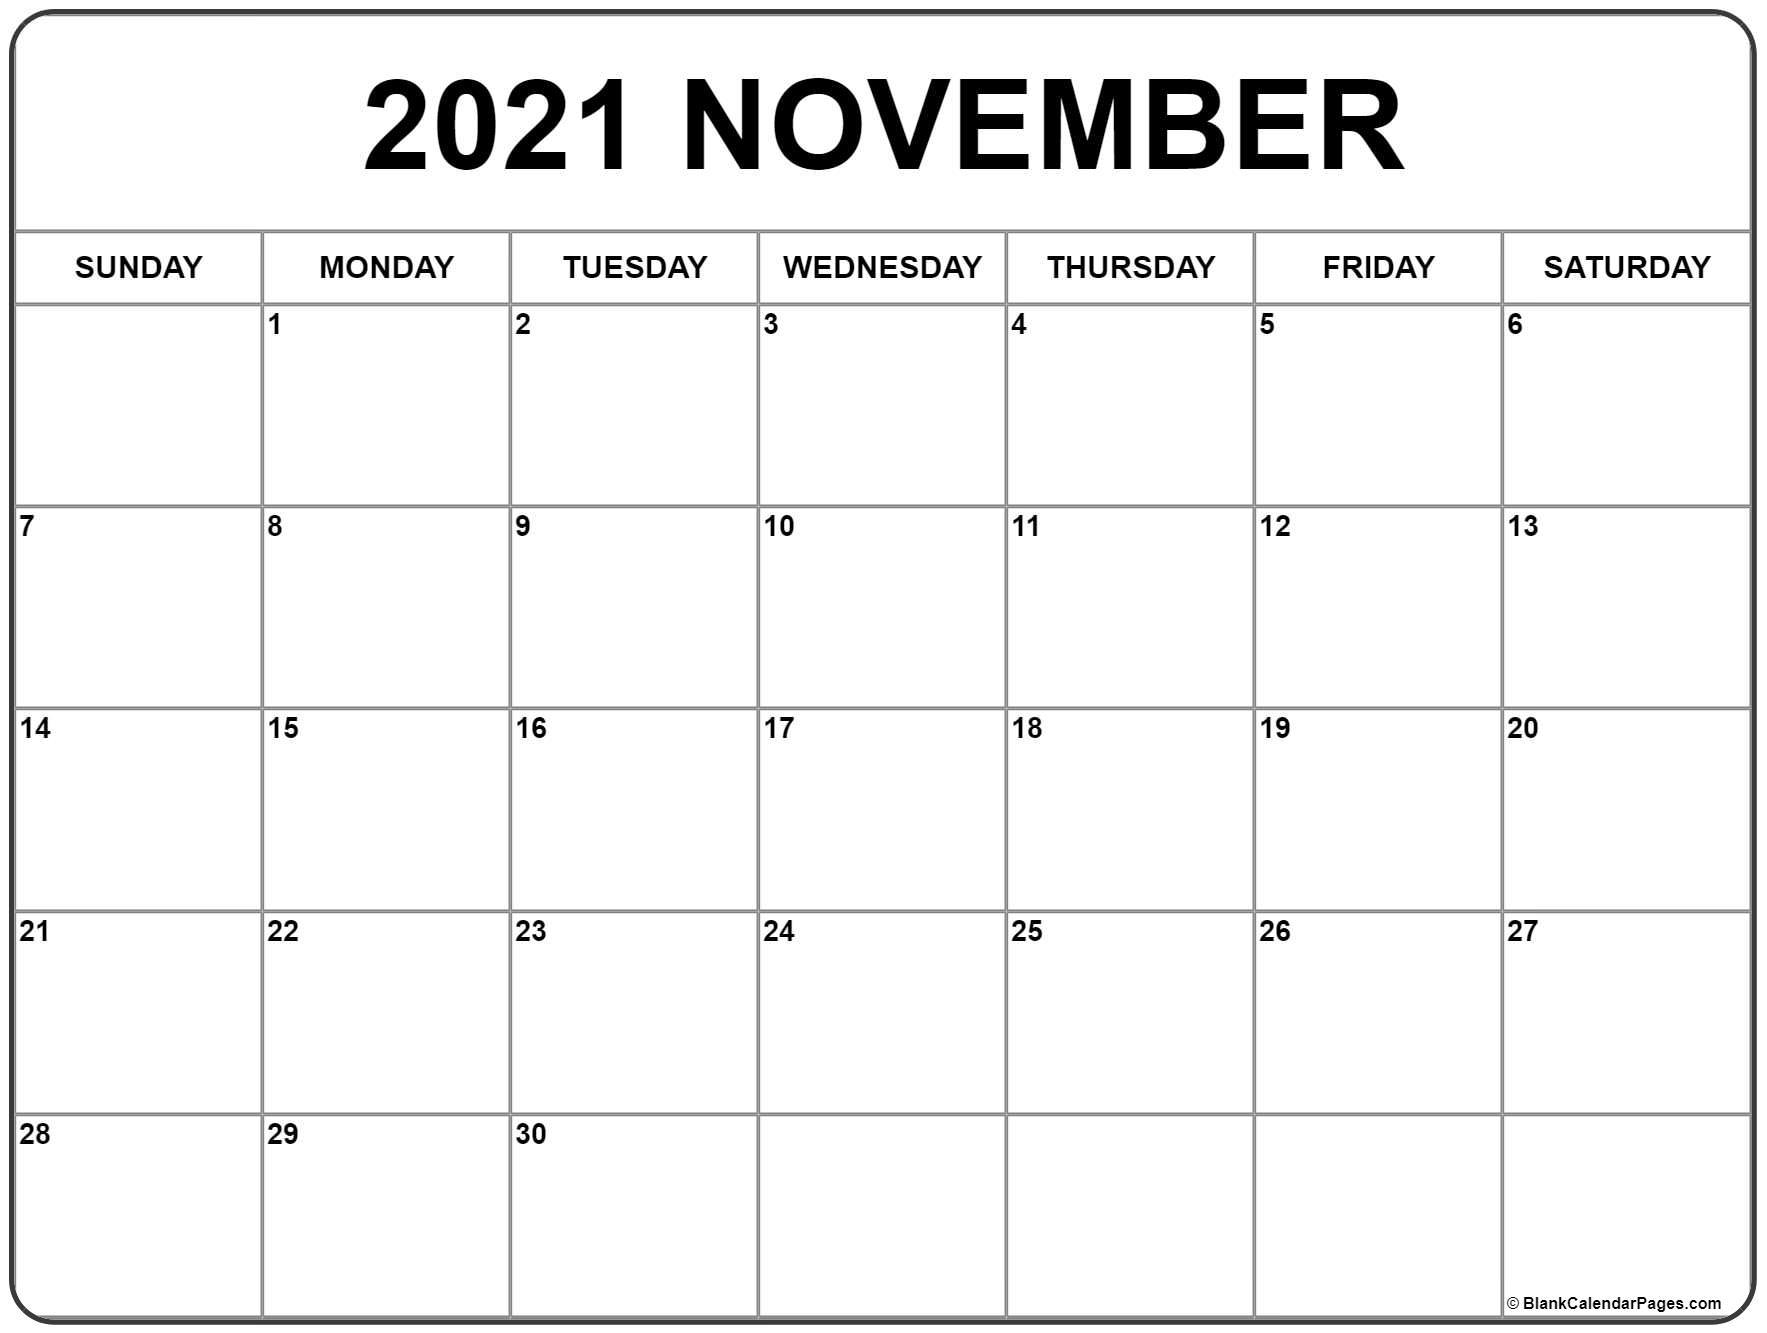 November 2021 Calendar   Free Printable Monthly Calendars pertaining to Calendar 2021 November Fill In